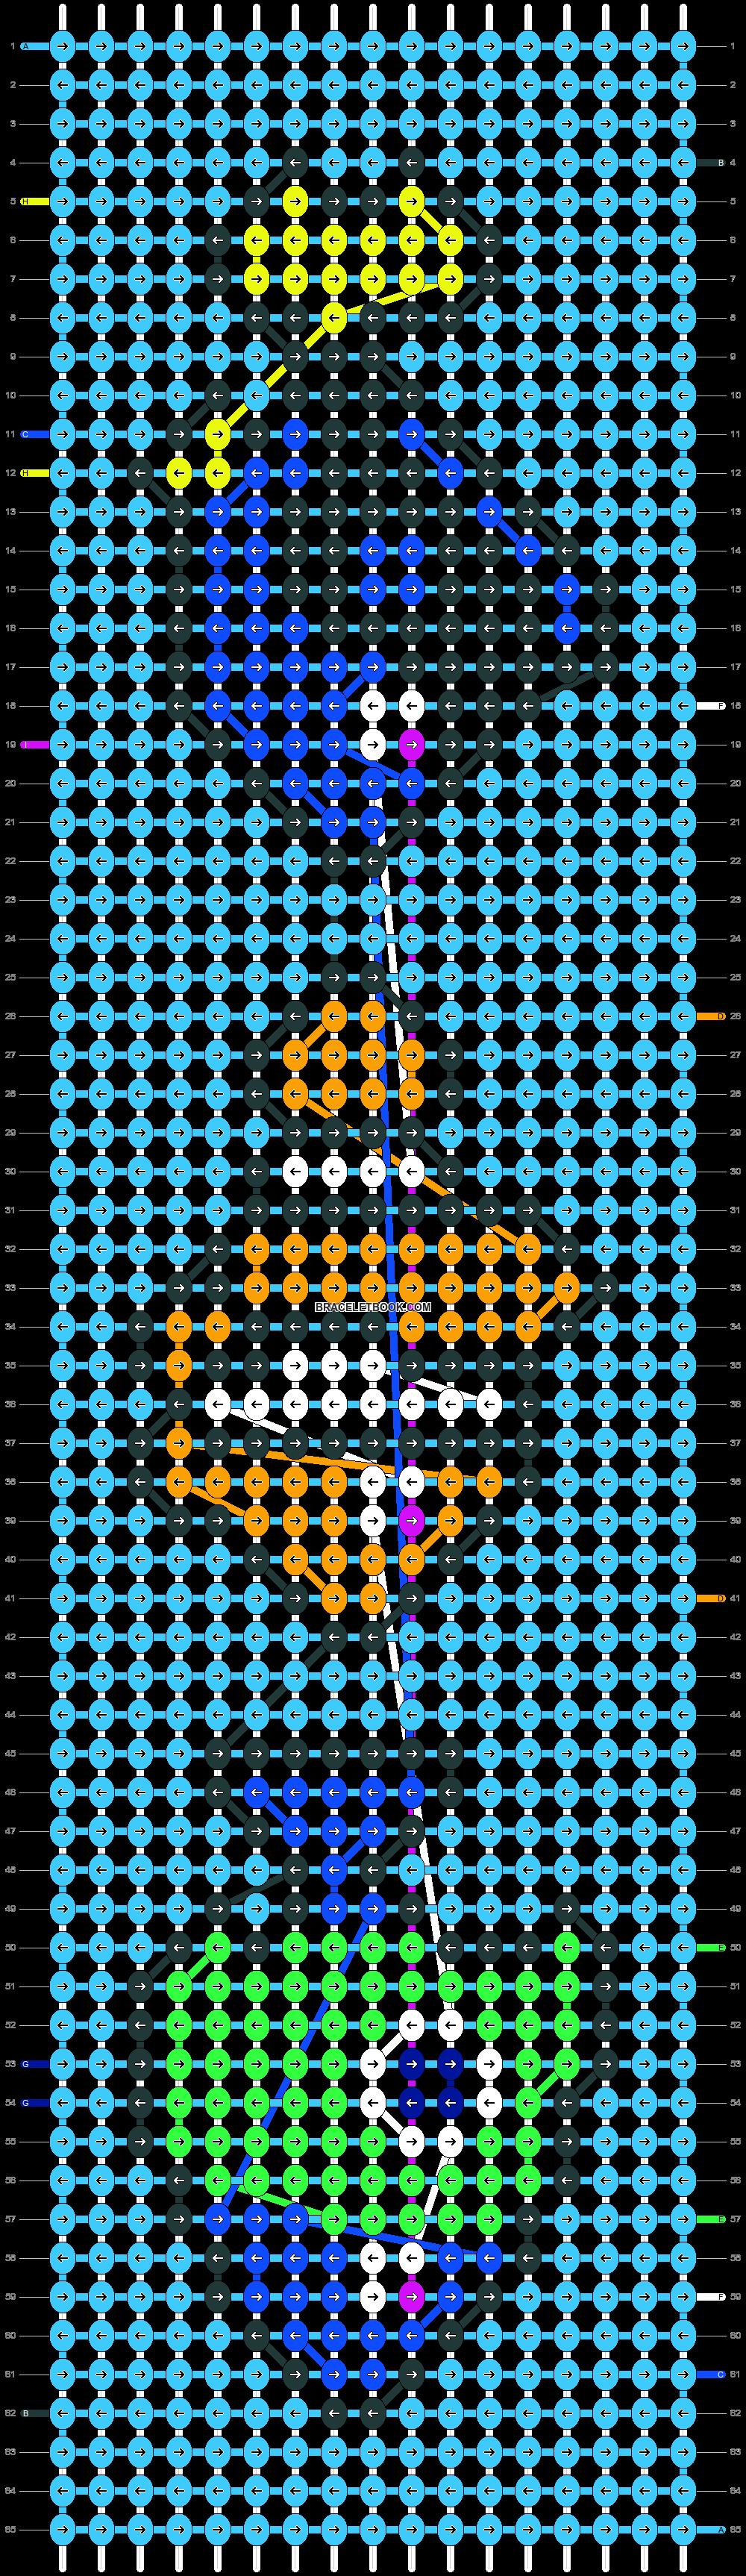 Alpha Pattern #22597 added by Pilvi